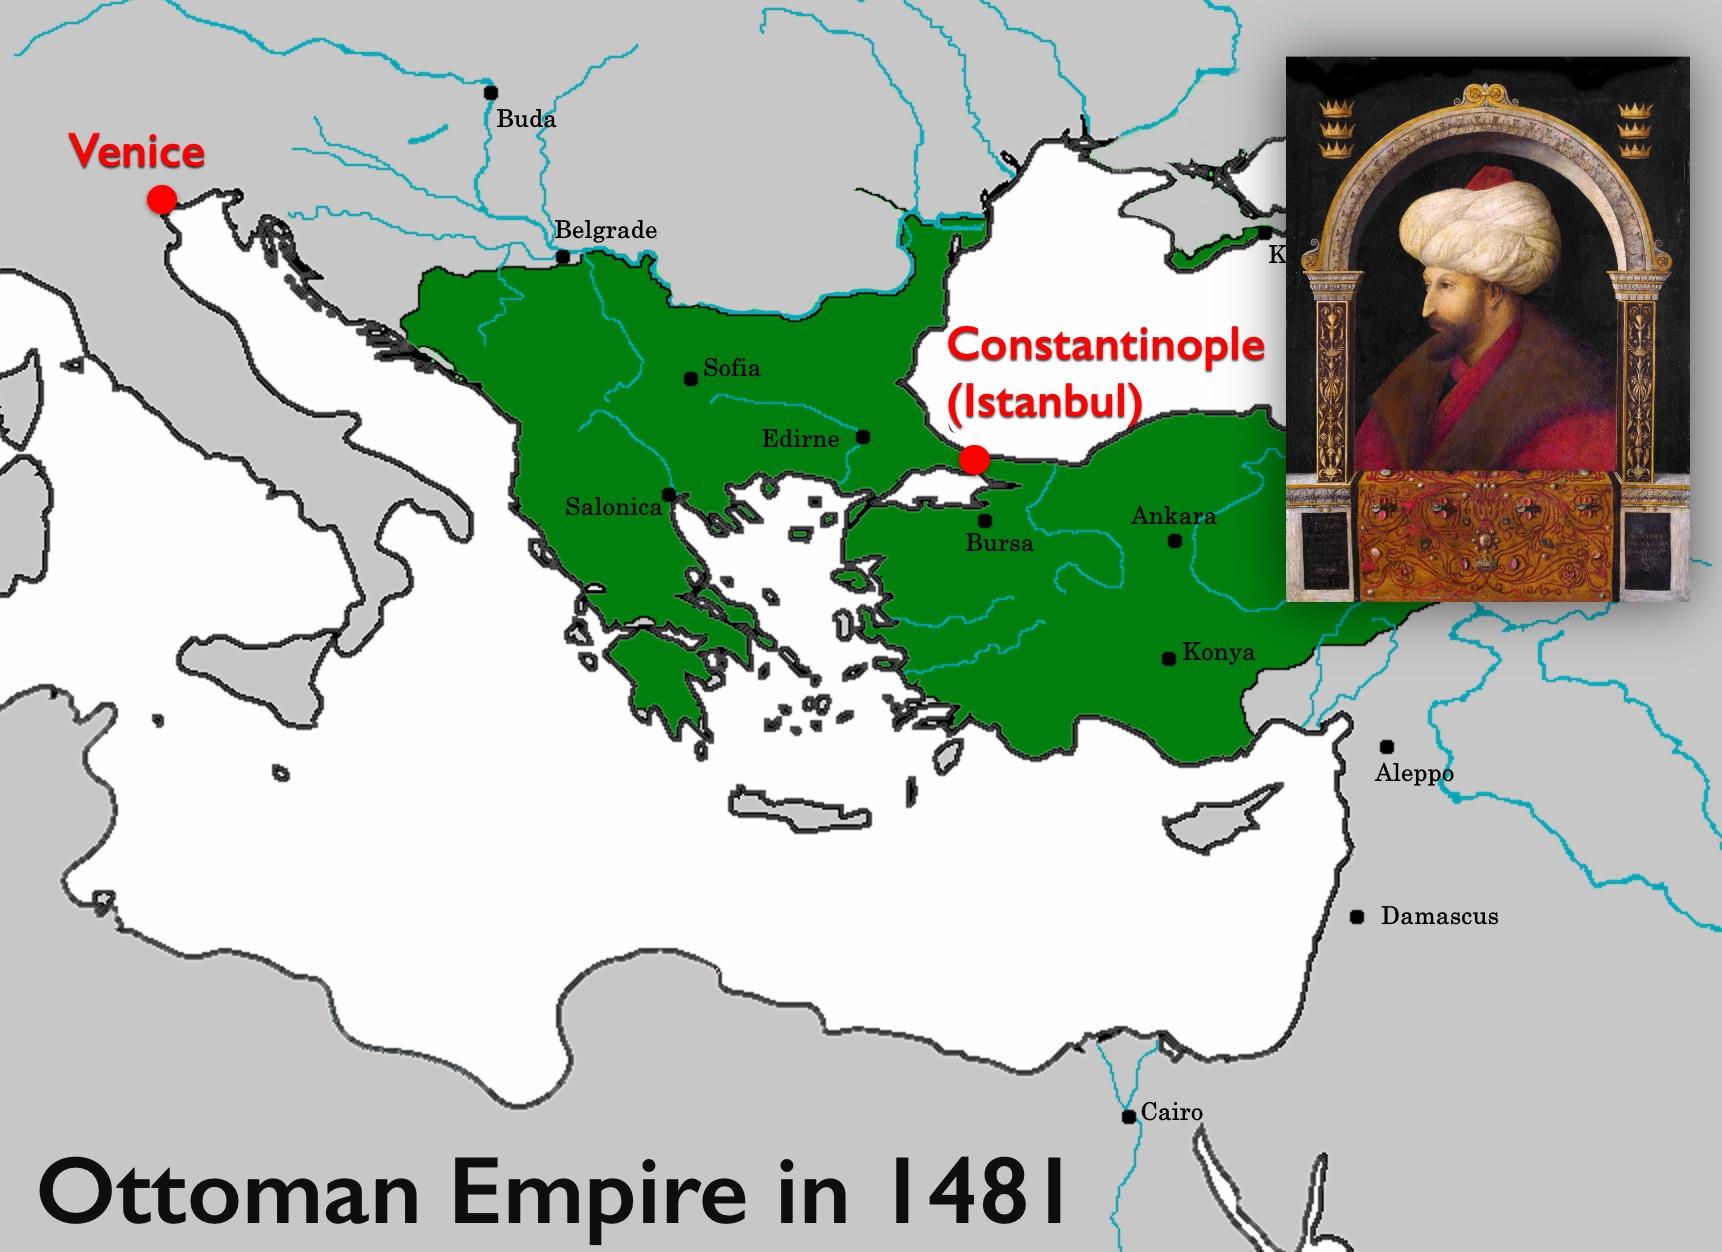 OttomanEmpire14810